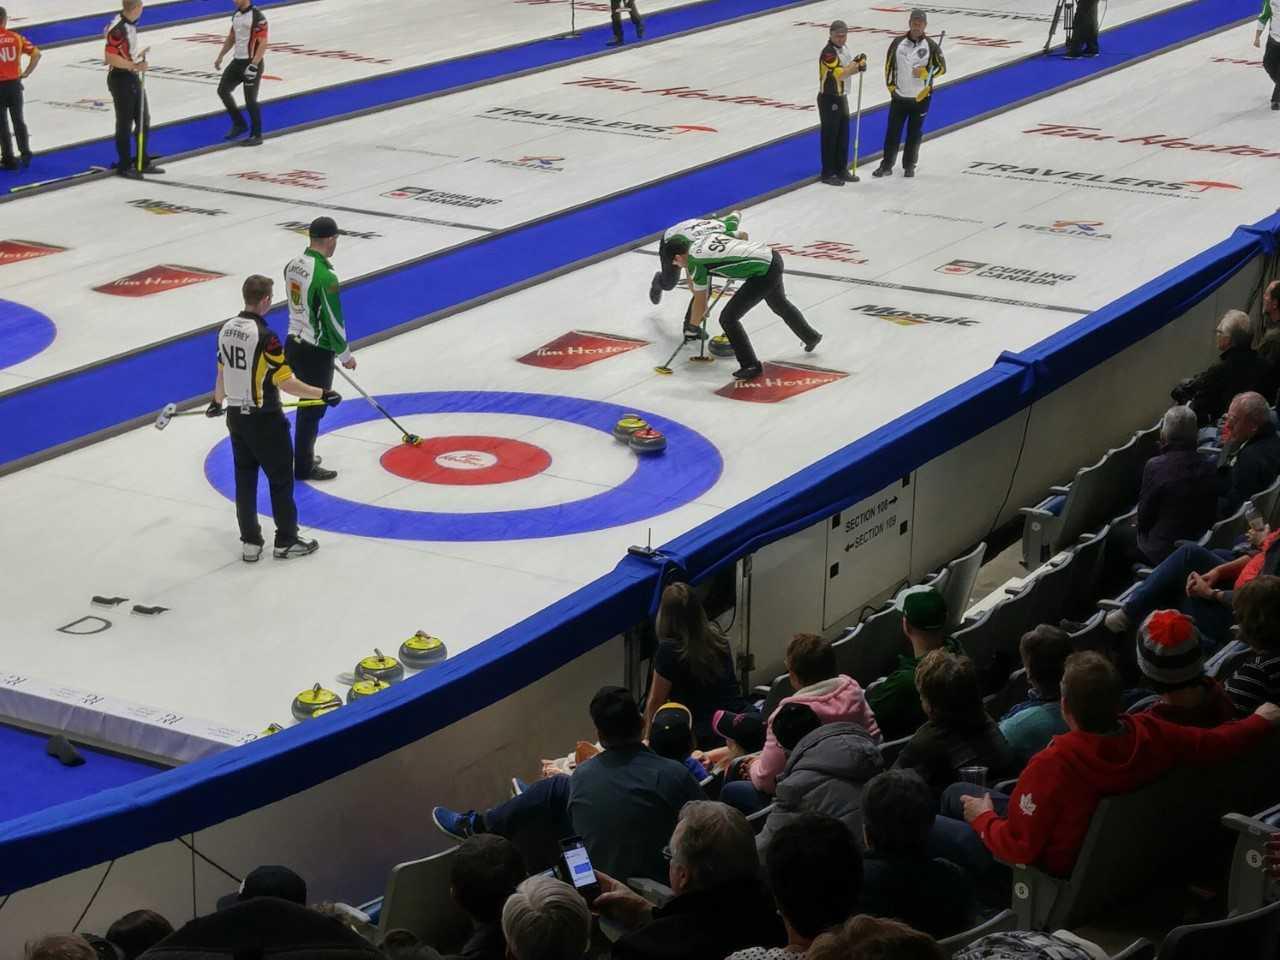 Saskatchewan gets its first win at Tim Hortons Brier